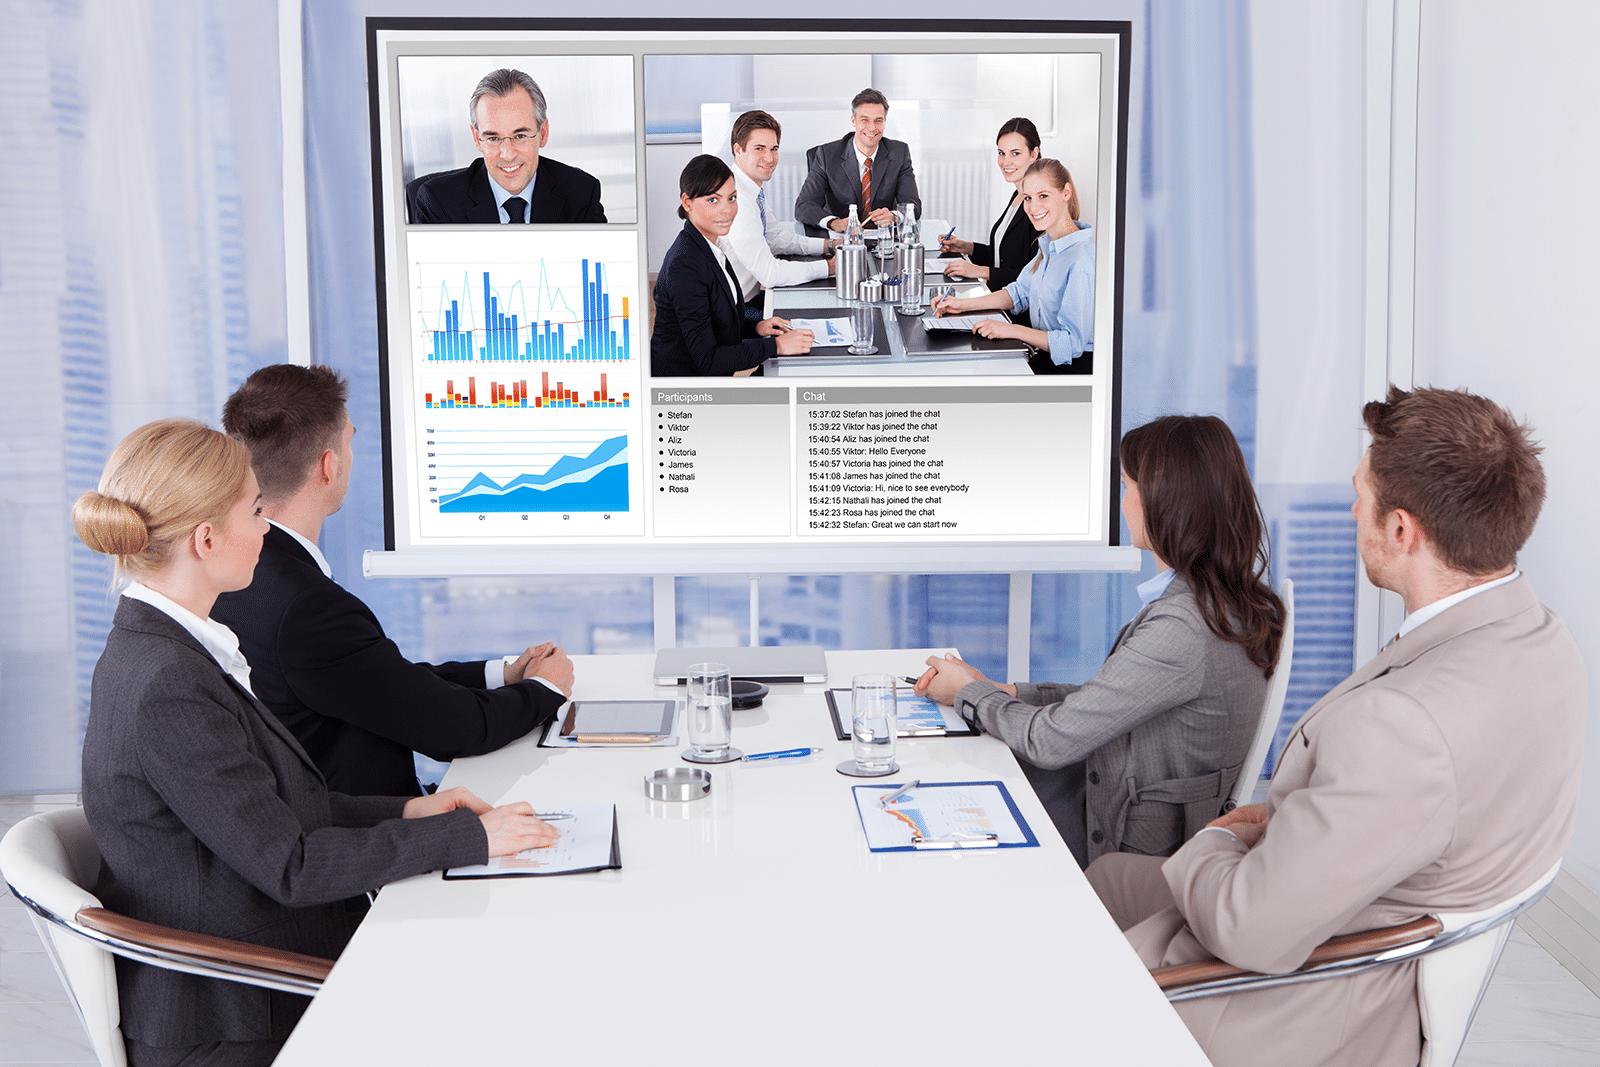 Conferene-call-di-qualità